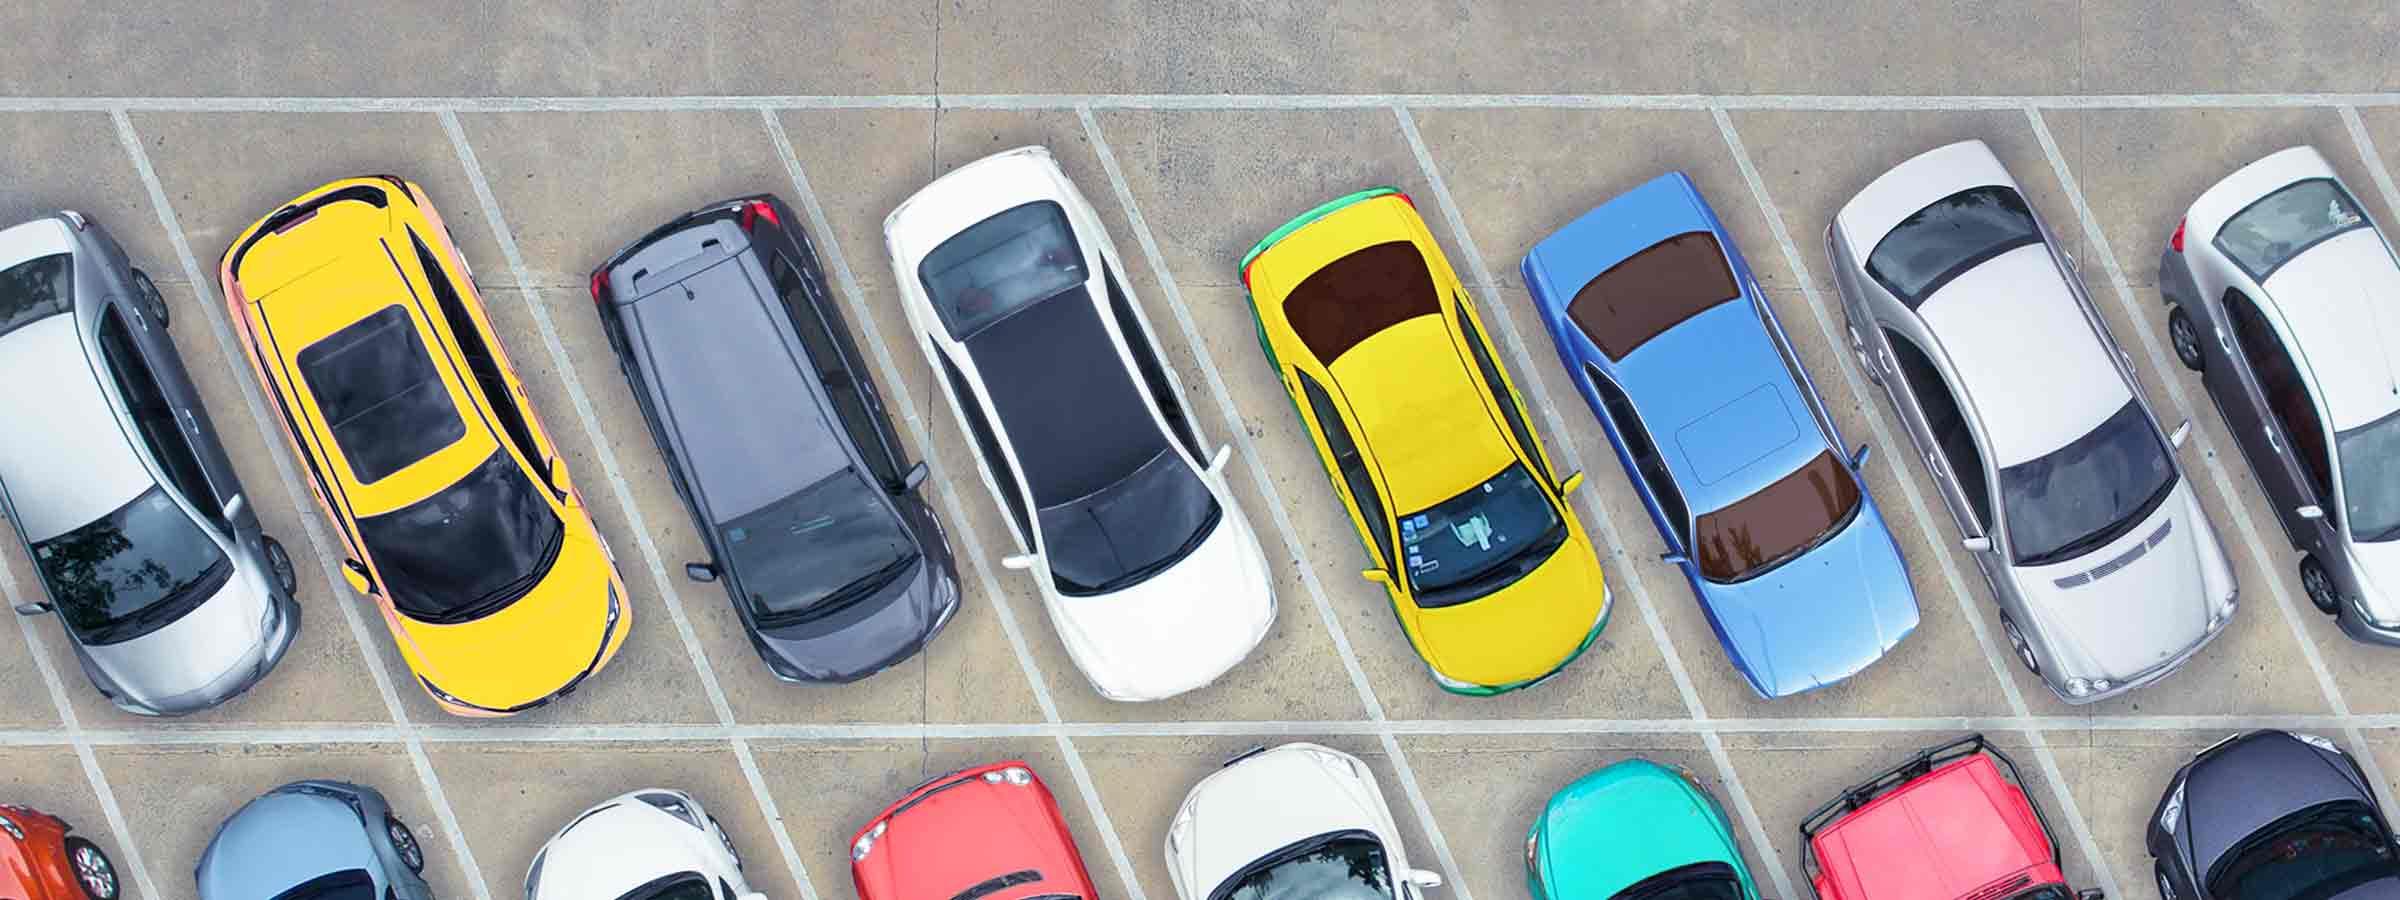 Firmenkunden Angebote Fahrzeuge Flotten-Lösungen